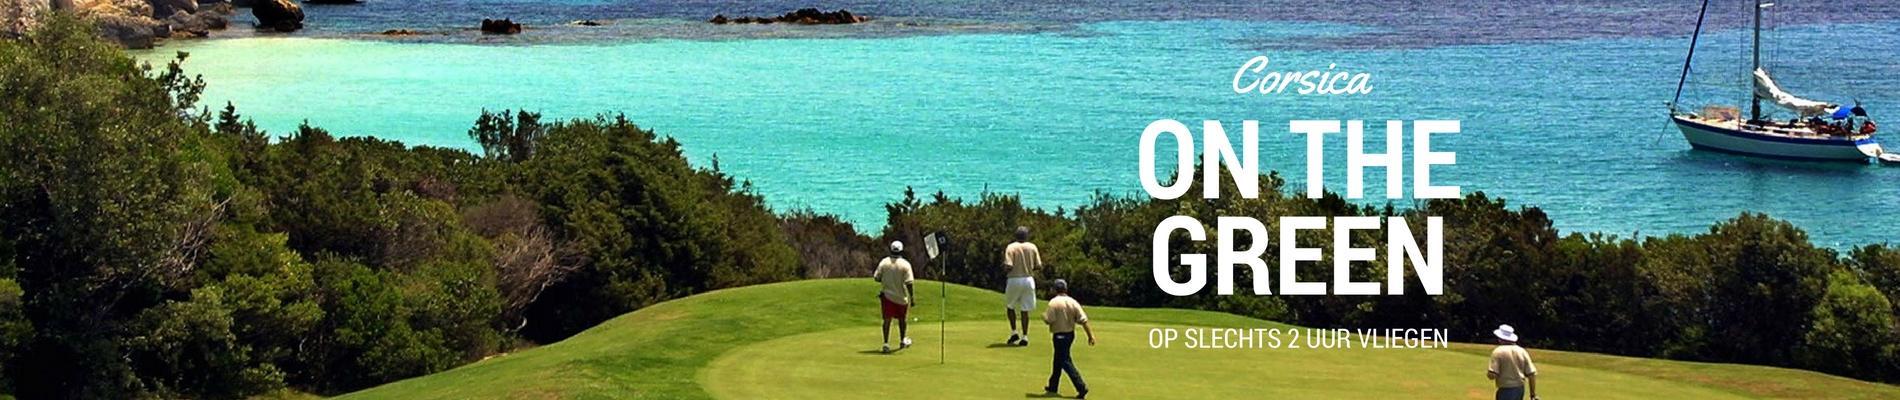 corsica banner golf 1900x400.jpg.jpg